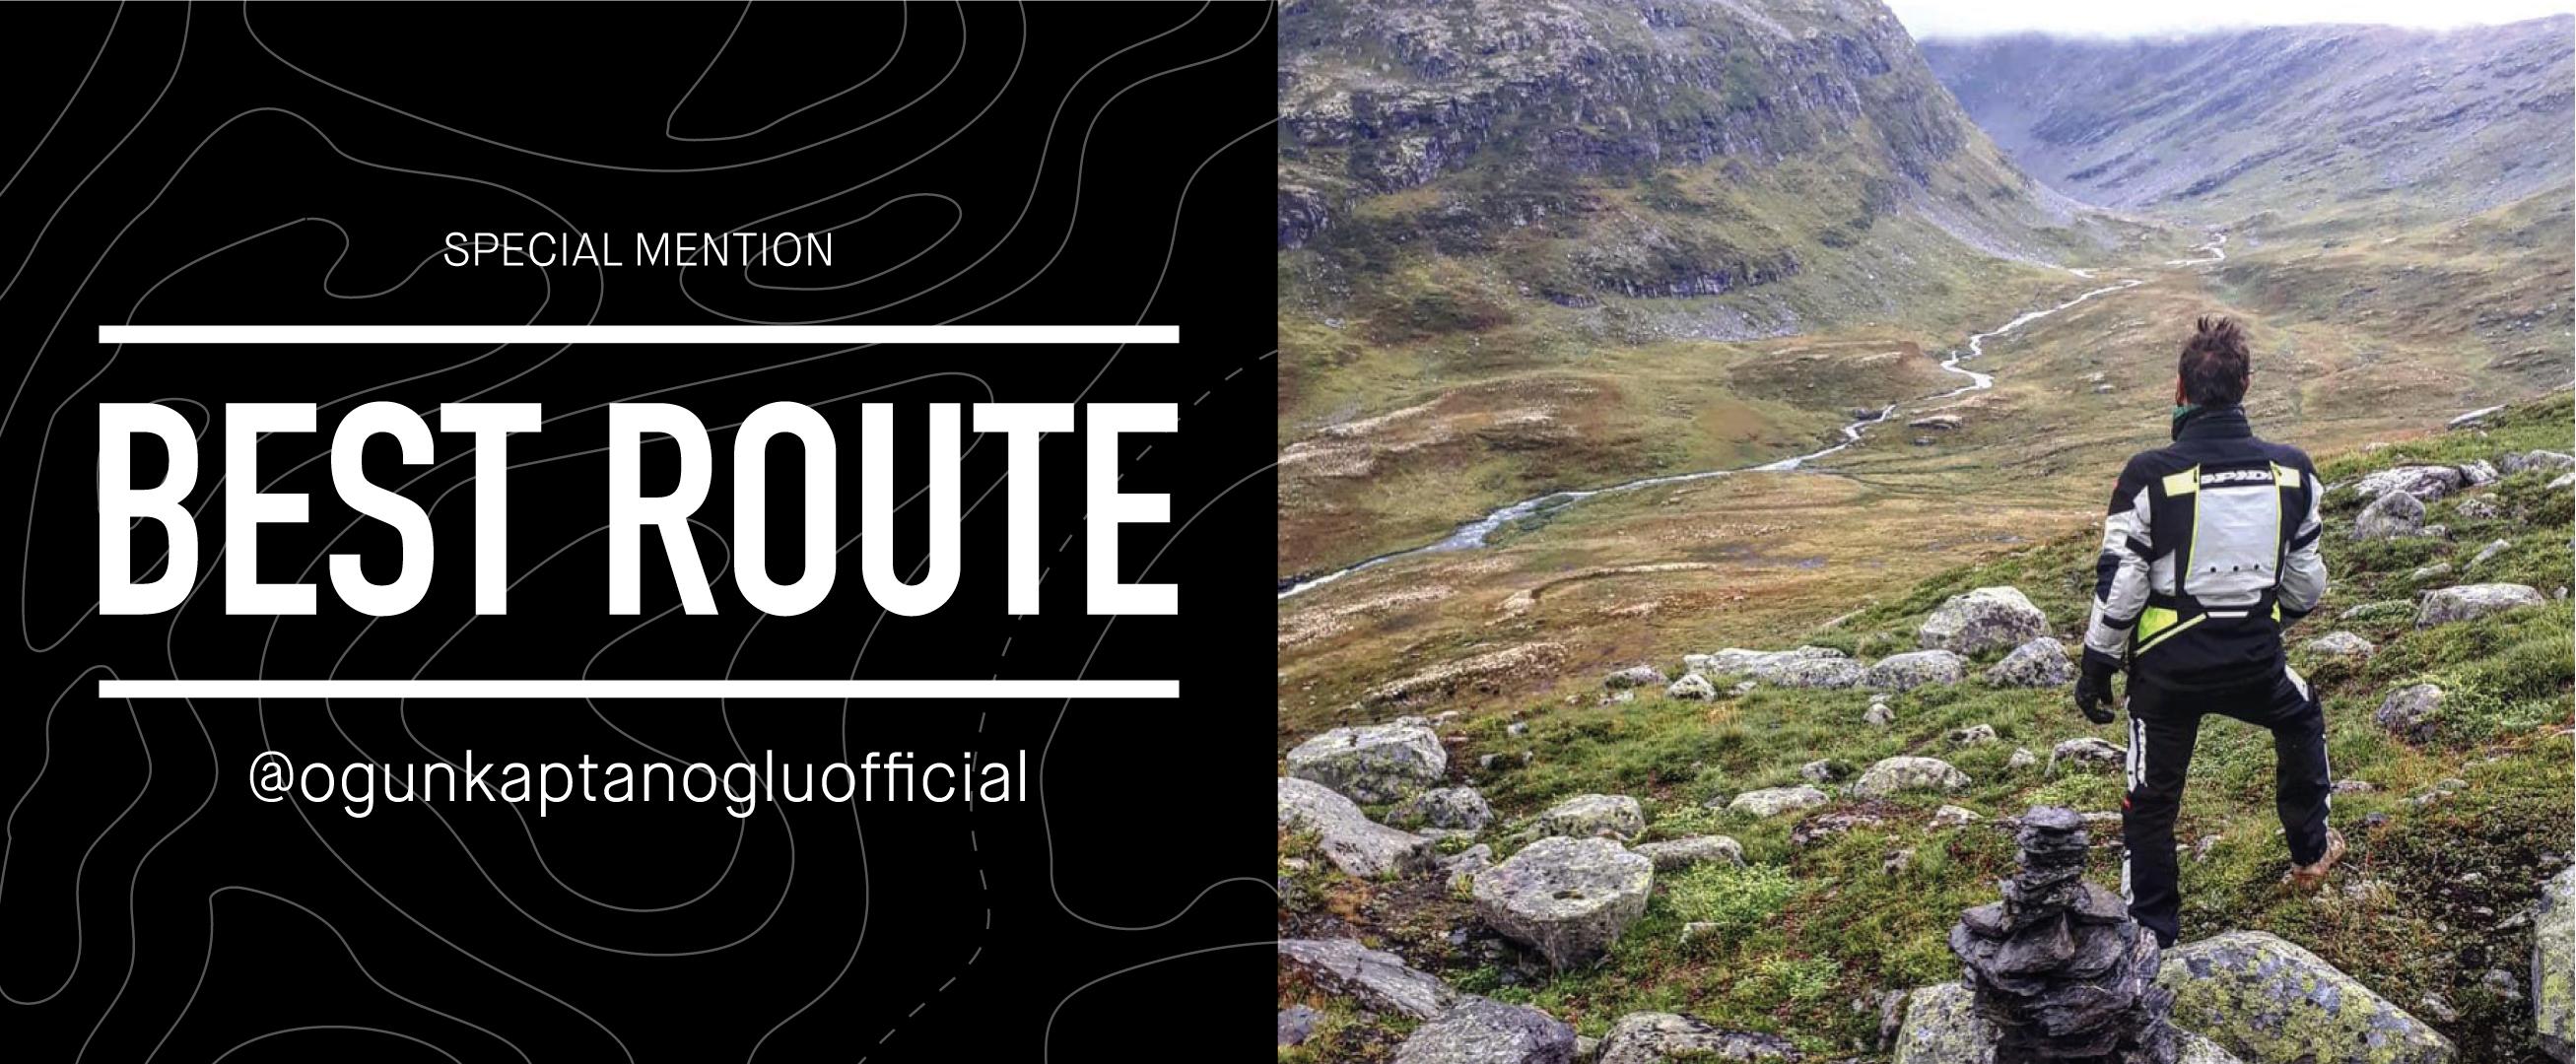 SPIDI_TestAndRide_best-route